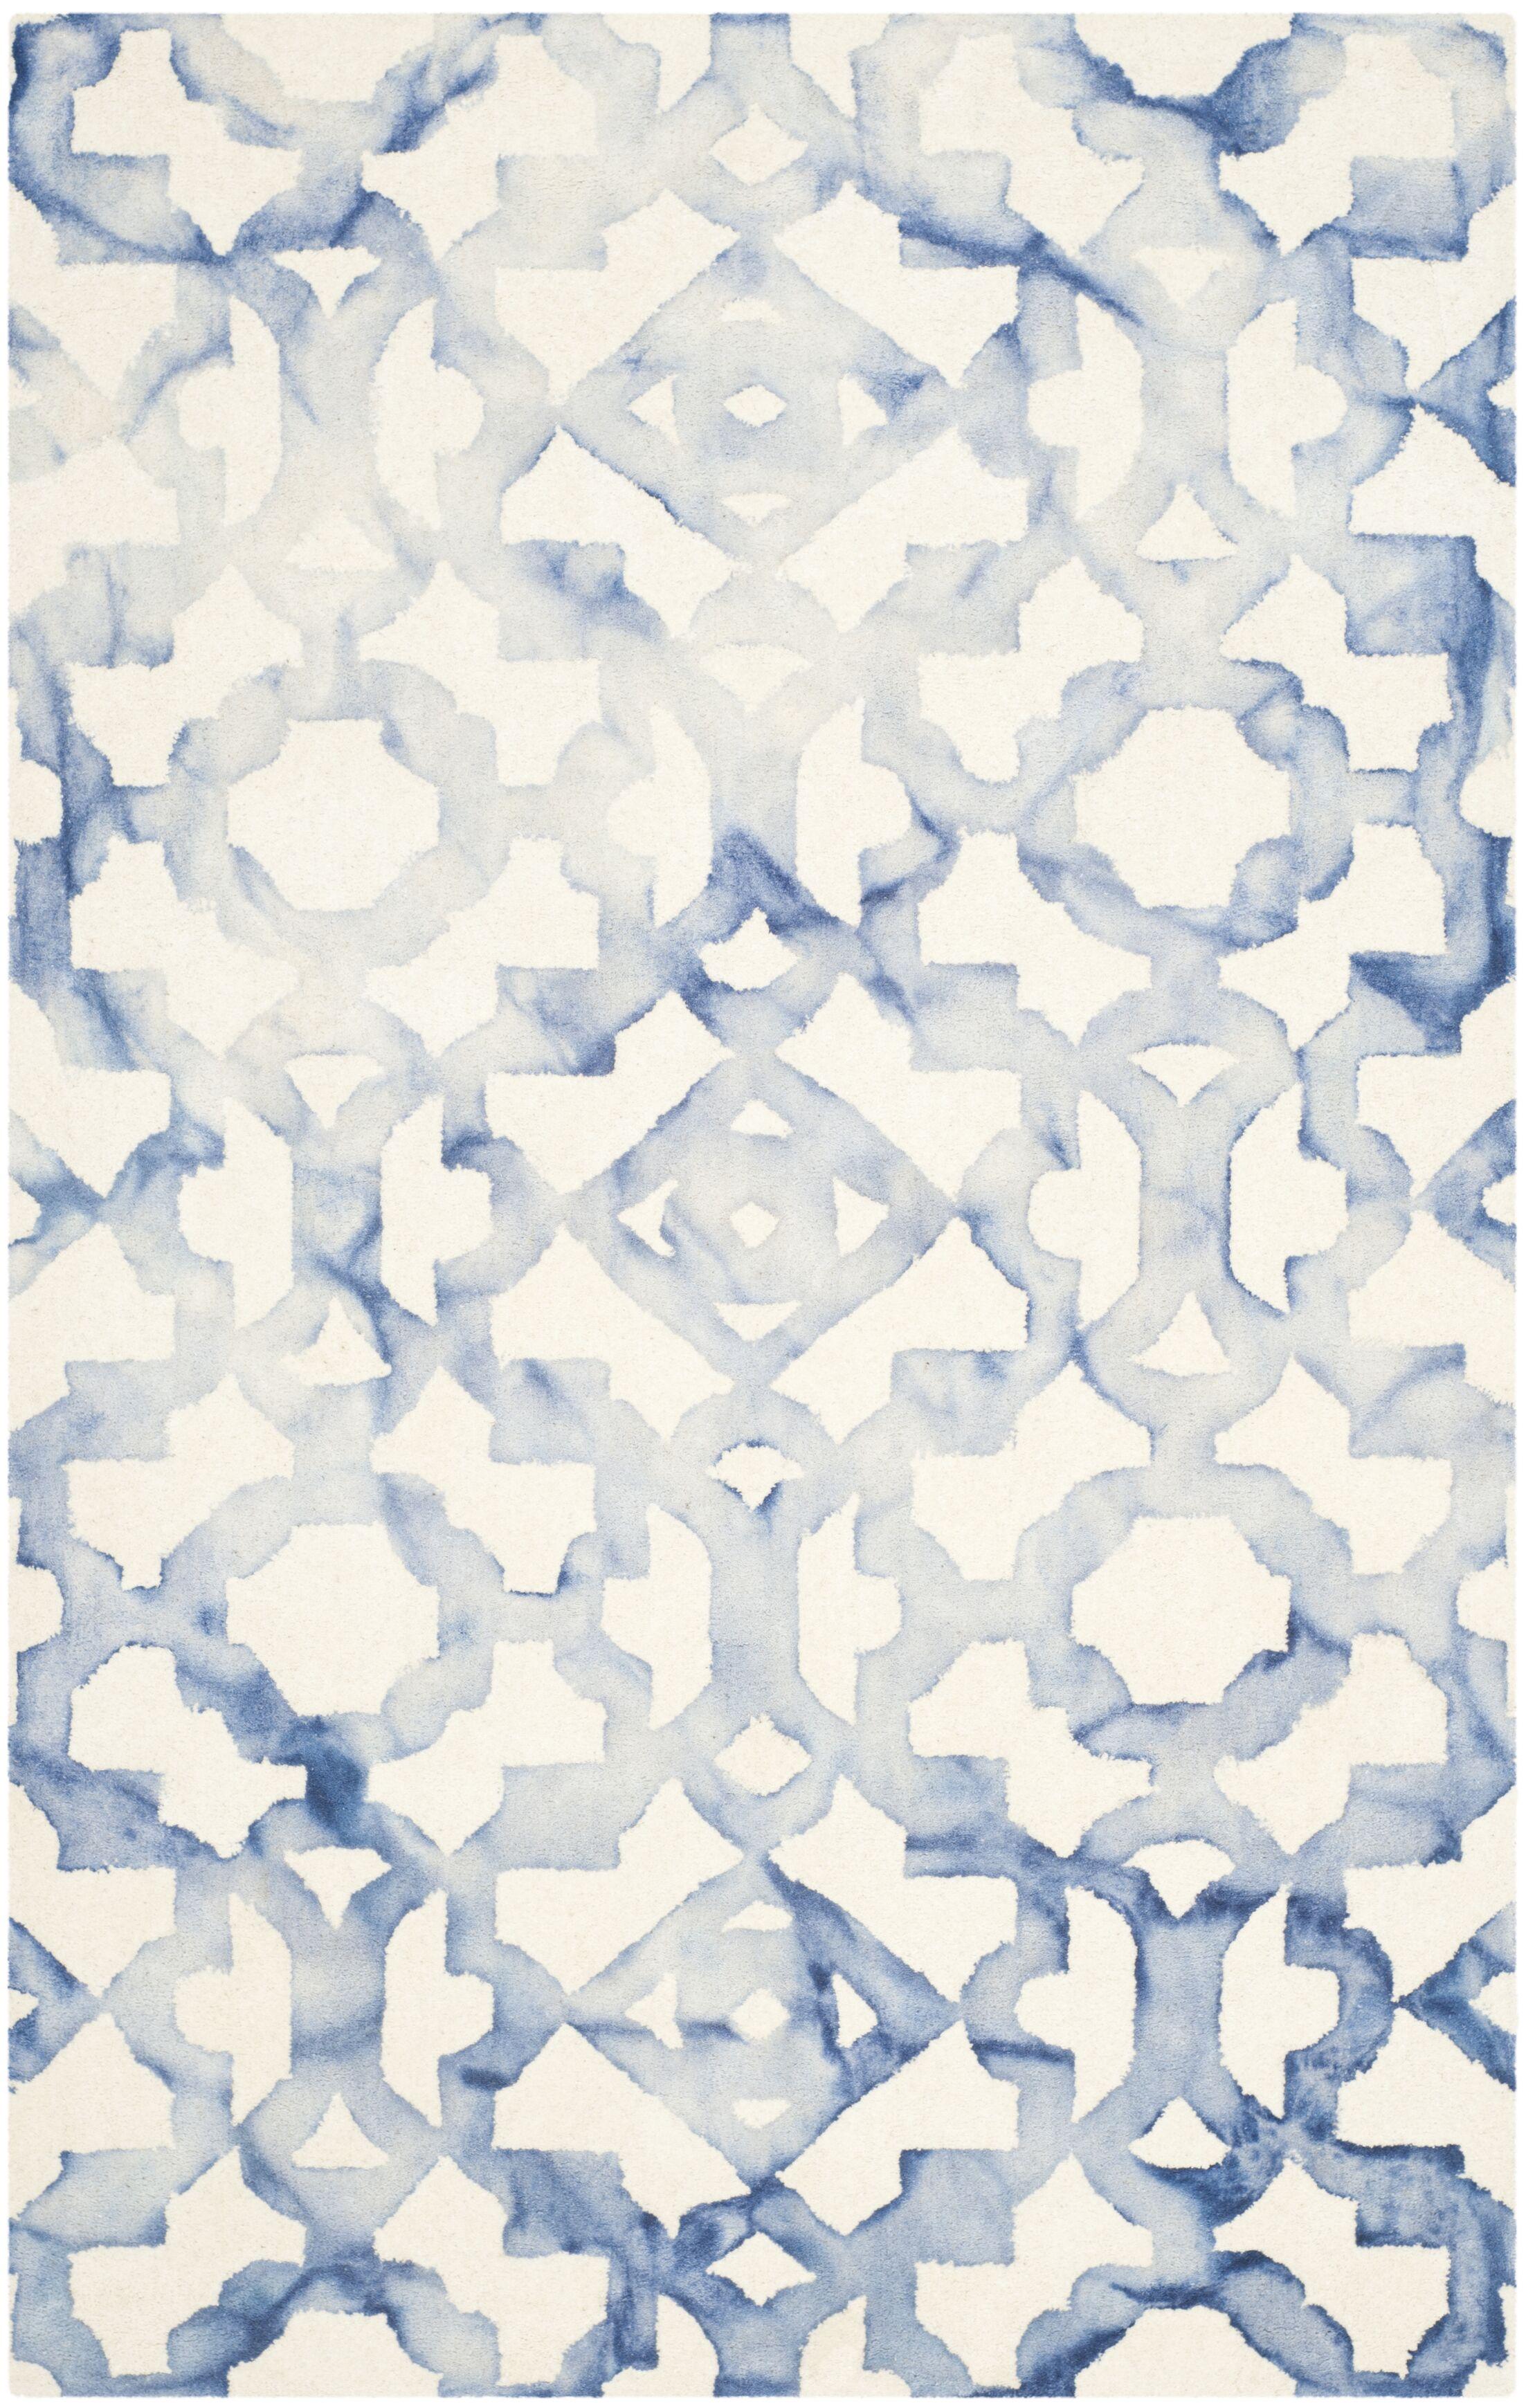 Jawhar Ivory/Blue Area Rug Rug Size: Rectangle 10' x 14'